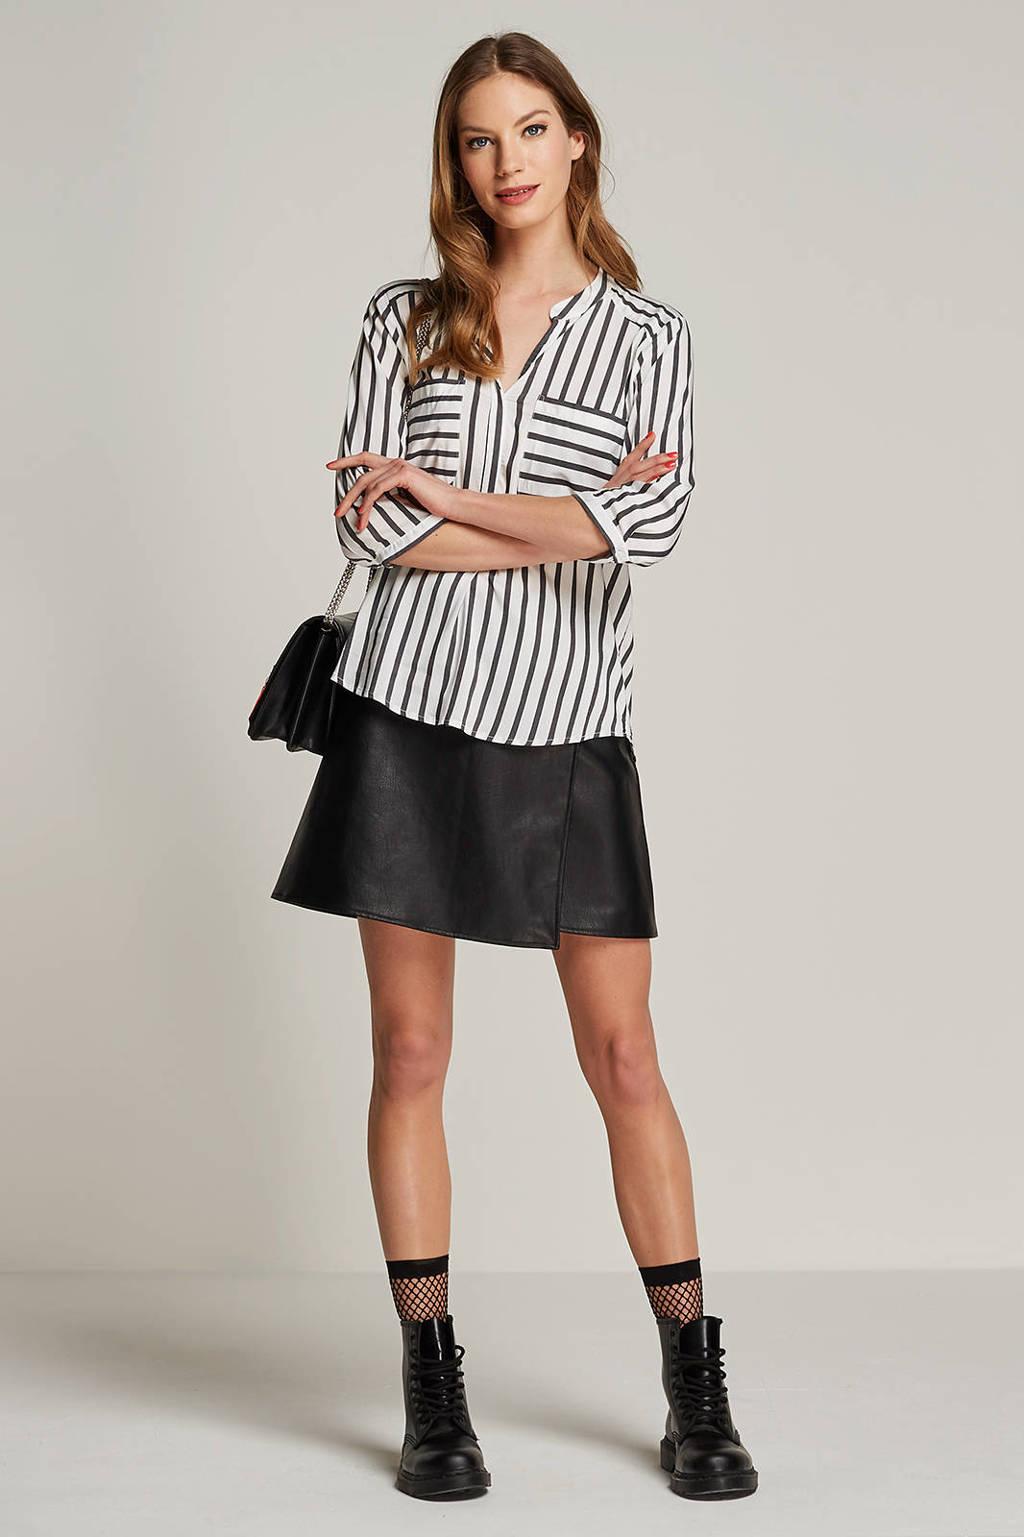 VERO MODA blouse met streepdessin, Ecru/grijs